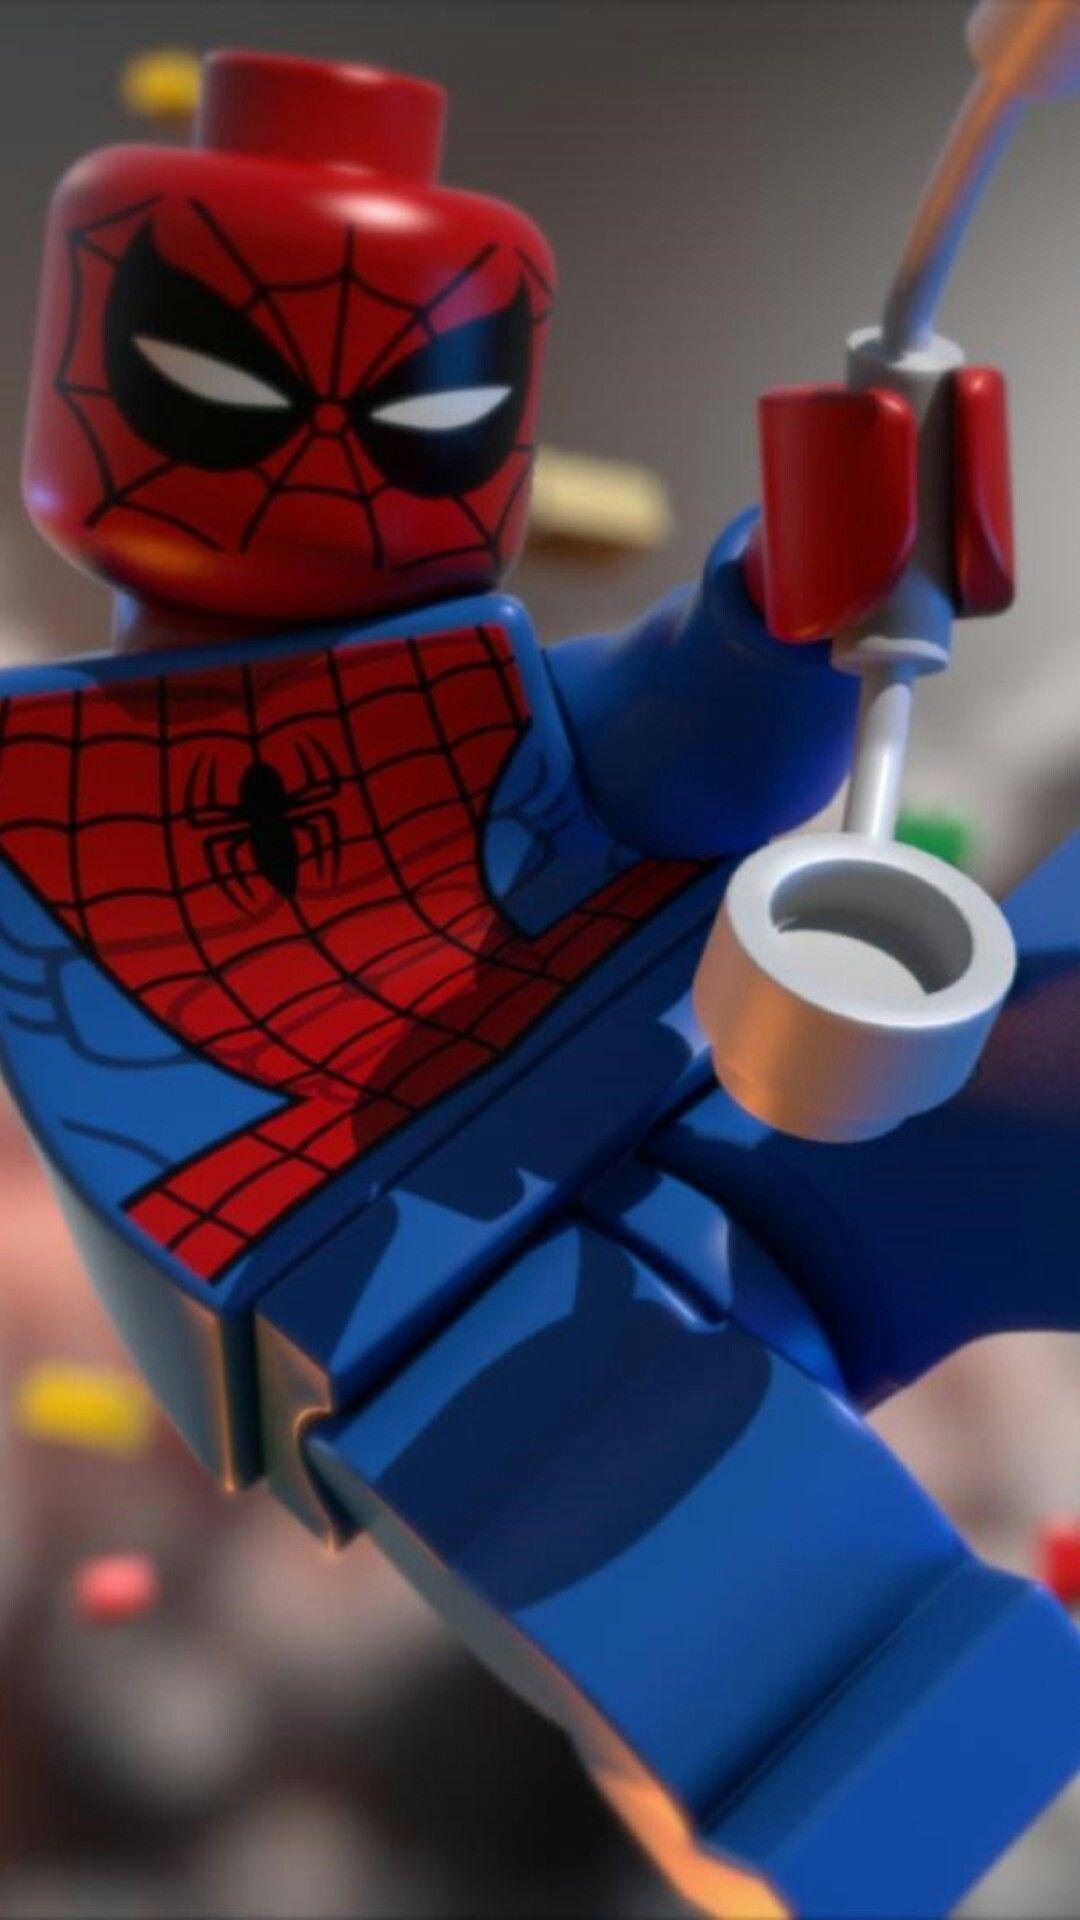 Spider Man Minifigura Lego